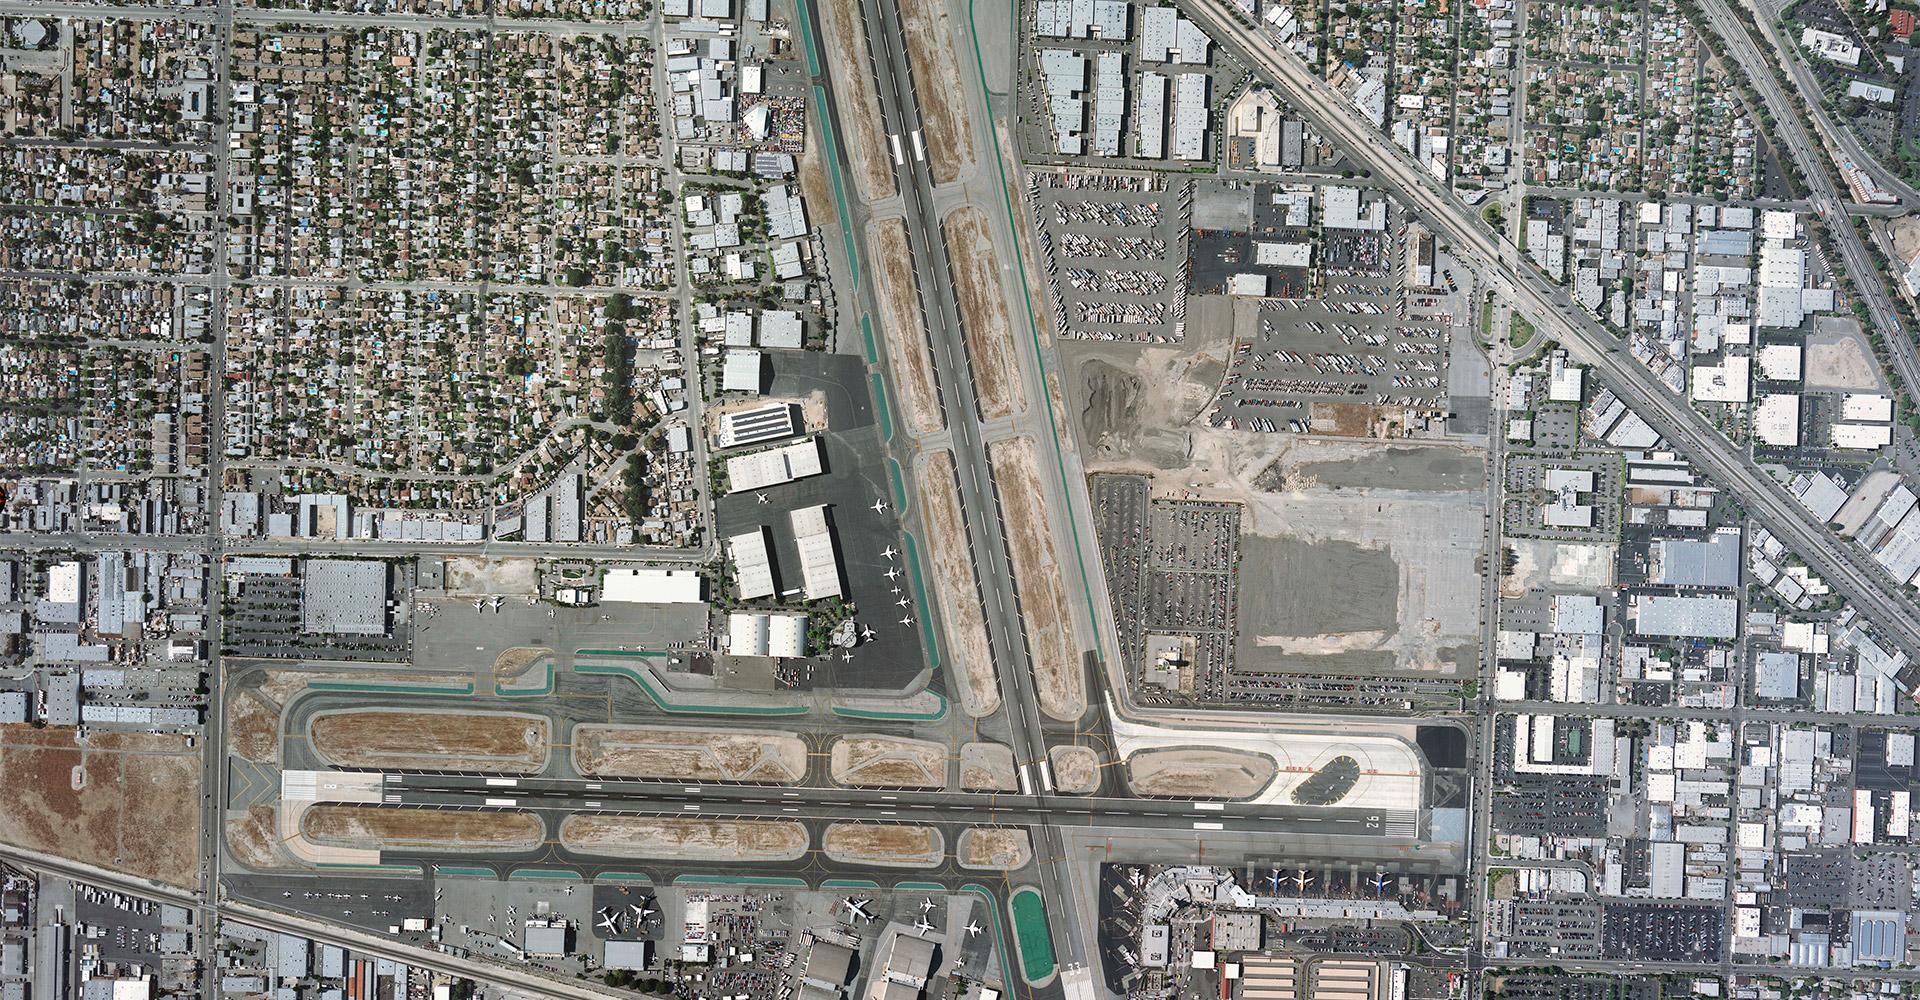 Aerial photo of Bob Hope Airport.